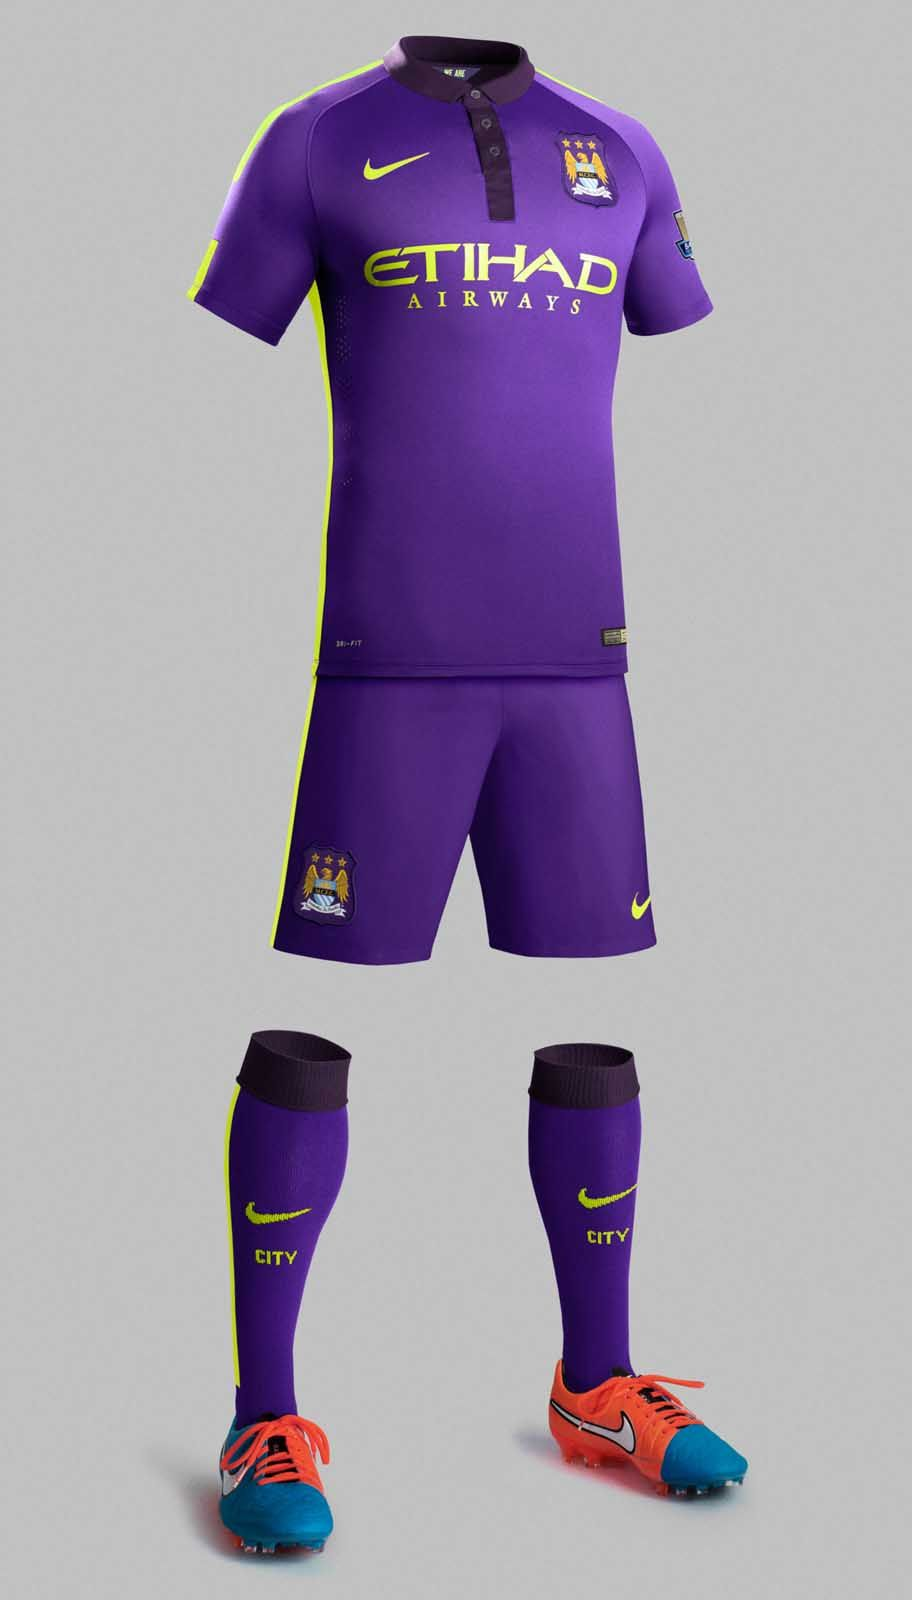 New Manchester City 14 15 Kits Uniformes Futebol Futebol Feminino Camisas De Futebol